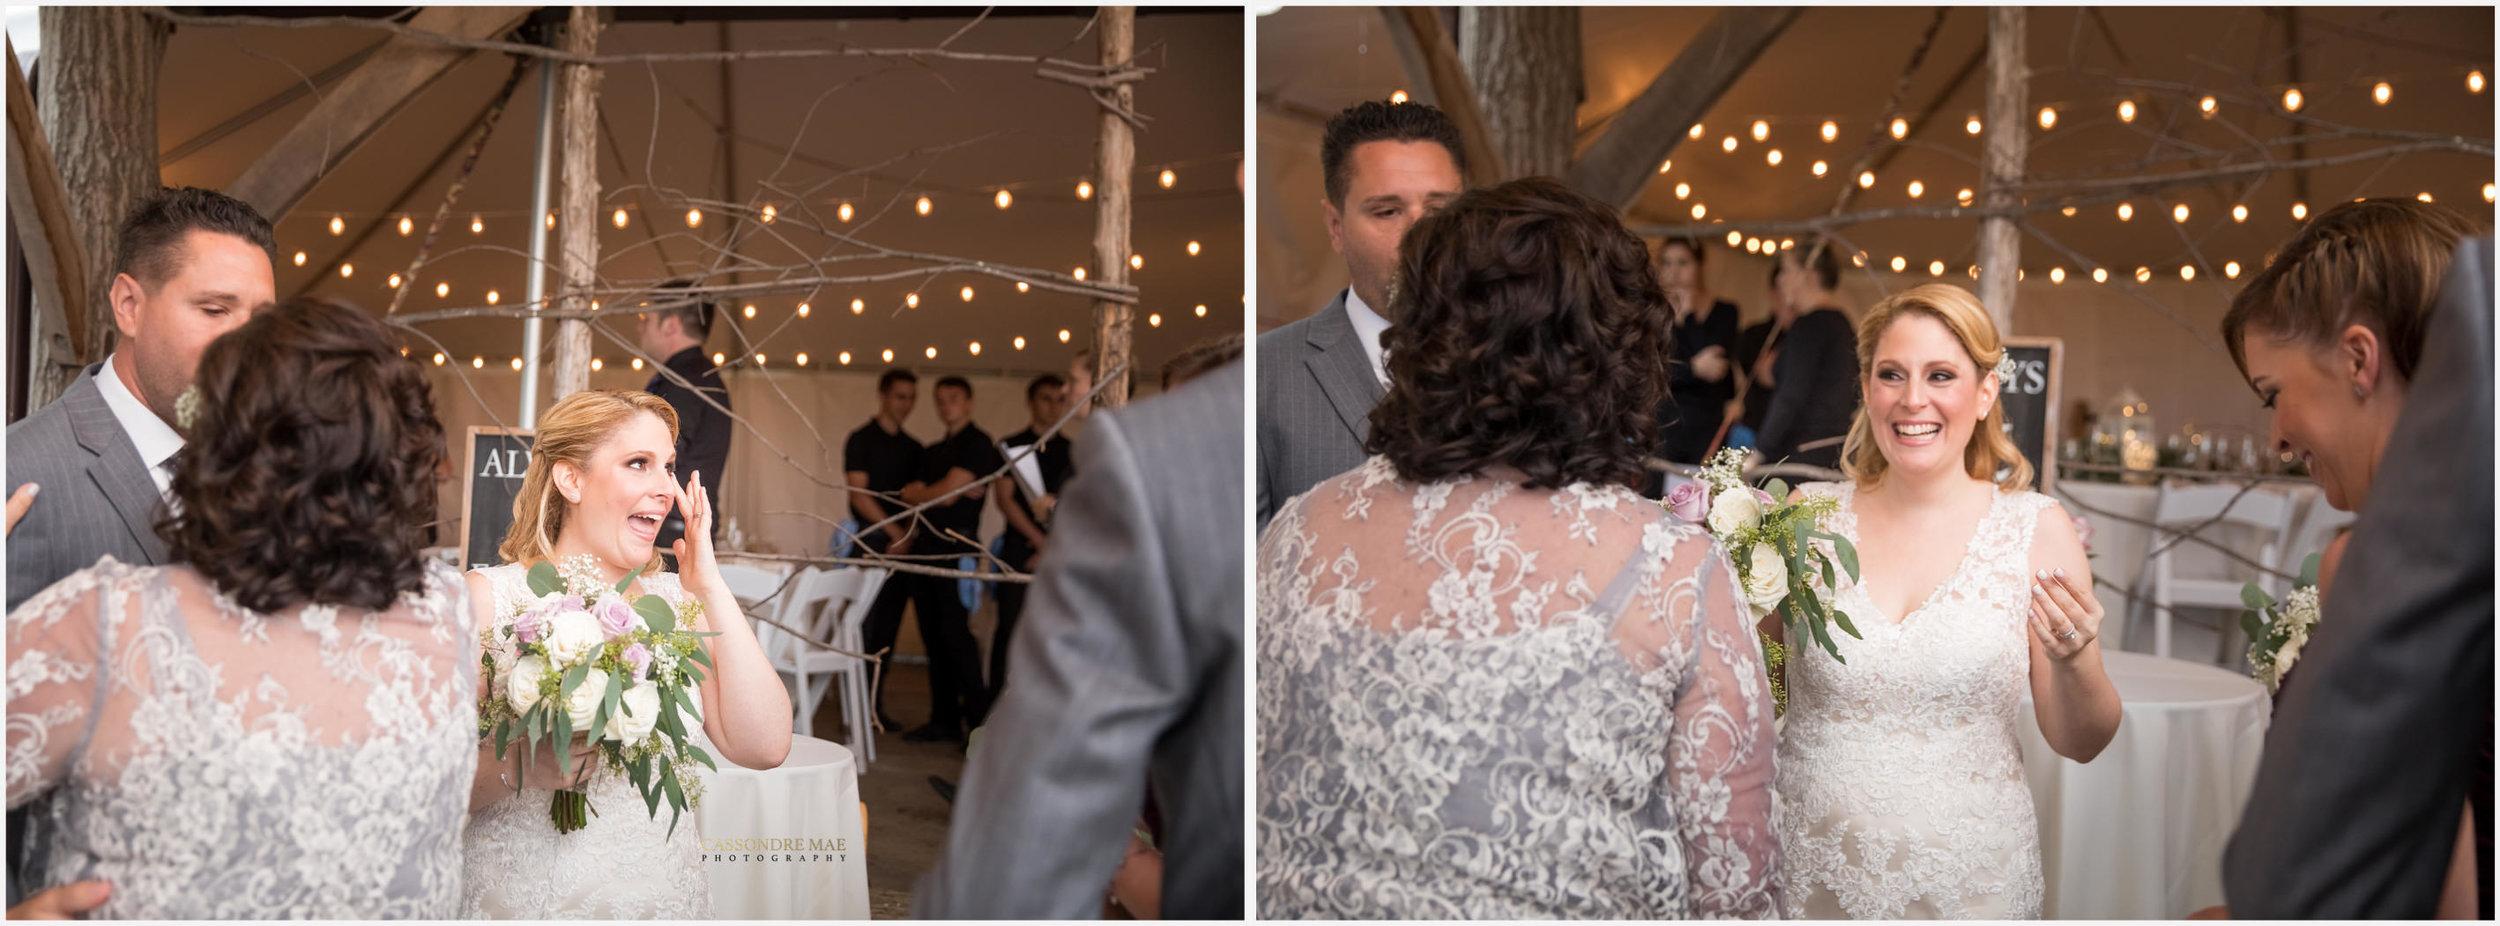 Cassondre Mae Photography Emmerich Tree Farm Wedding 19.jpg